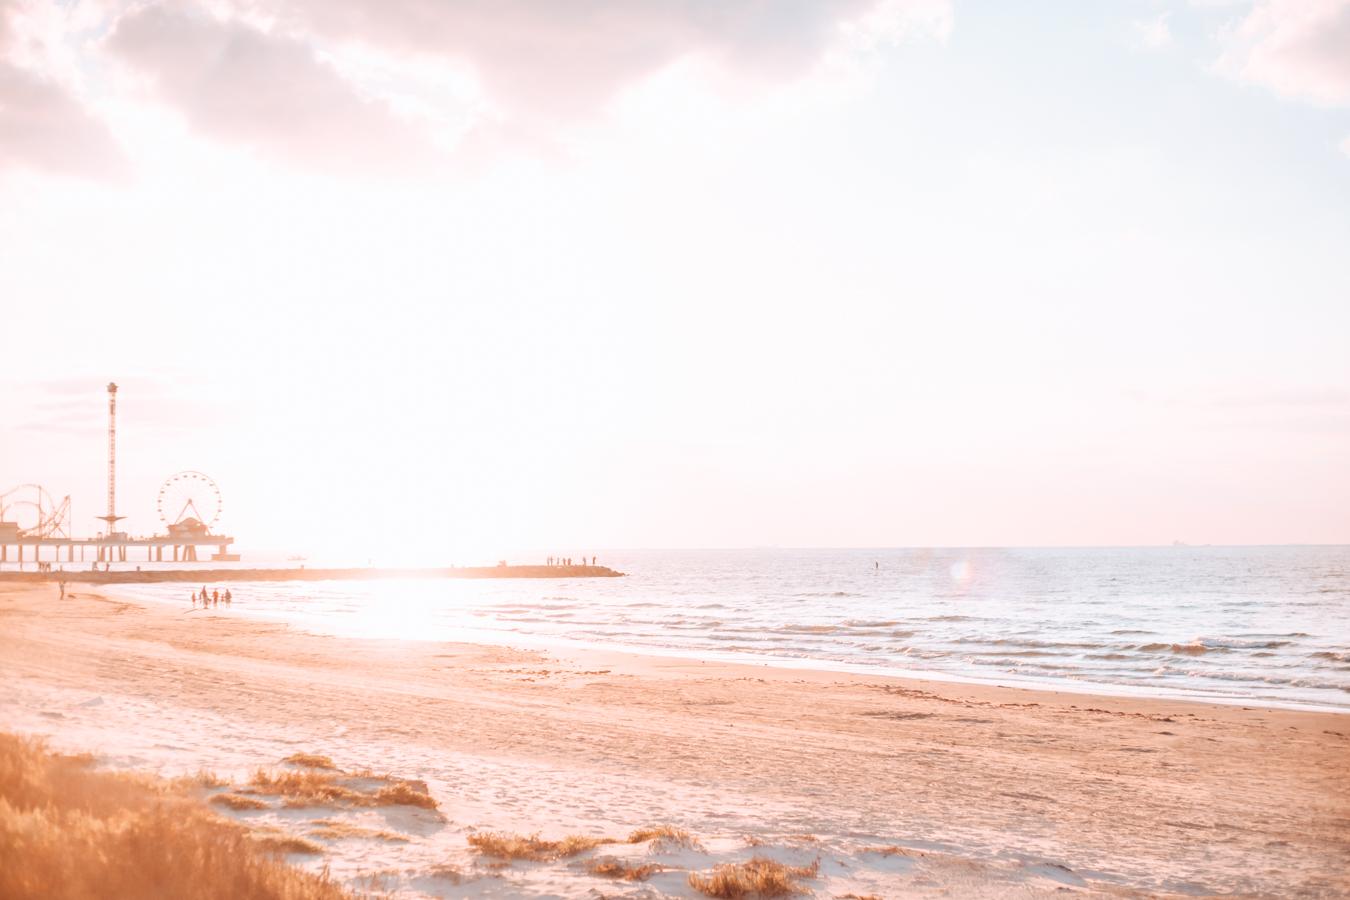 Beach in Galveston in Texas